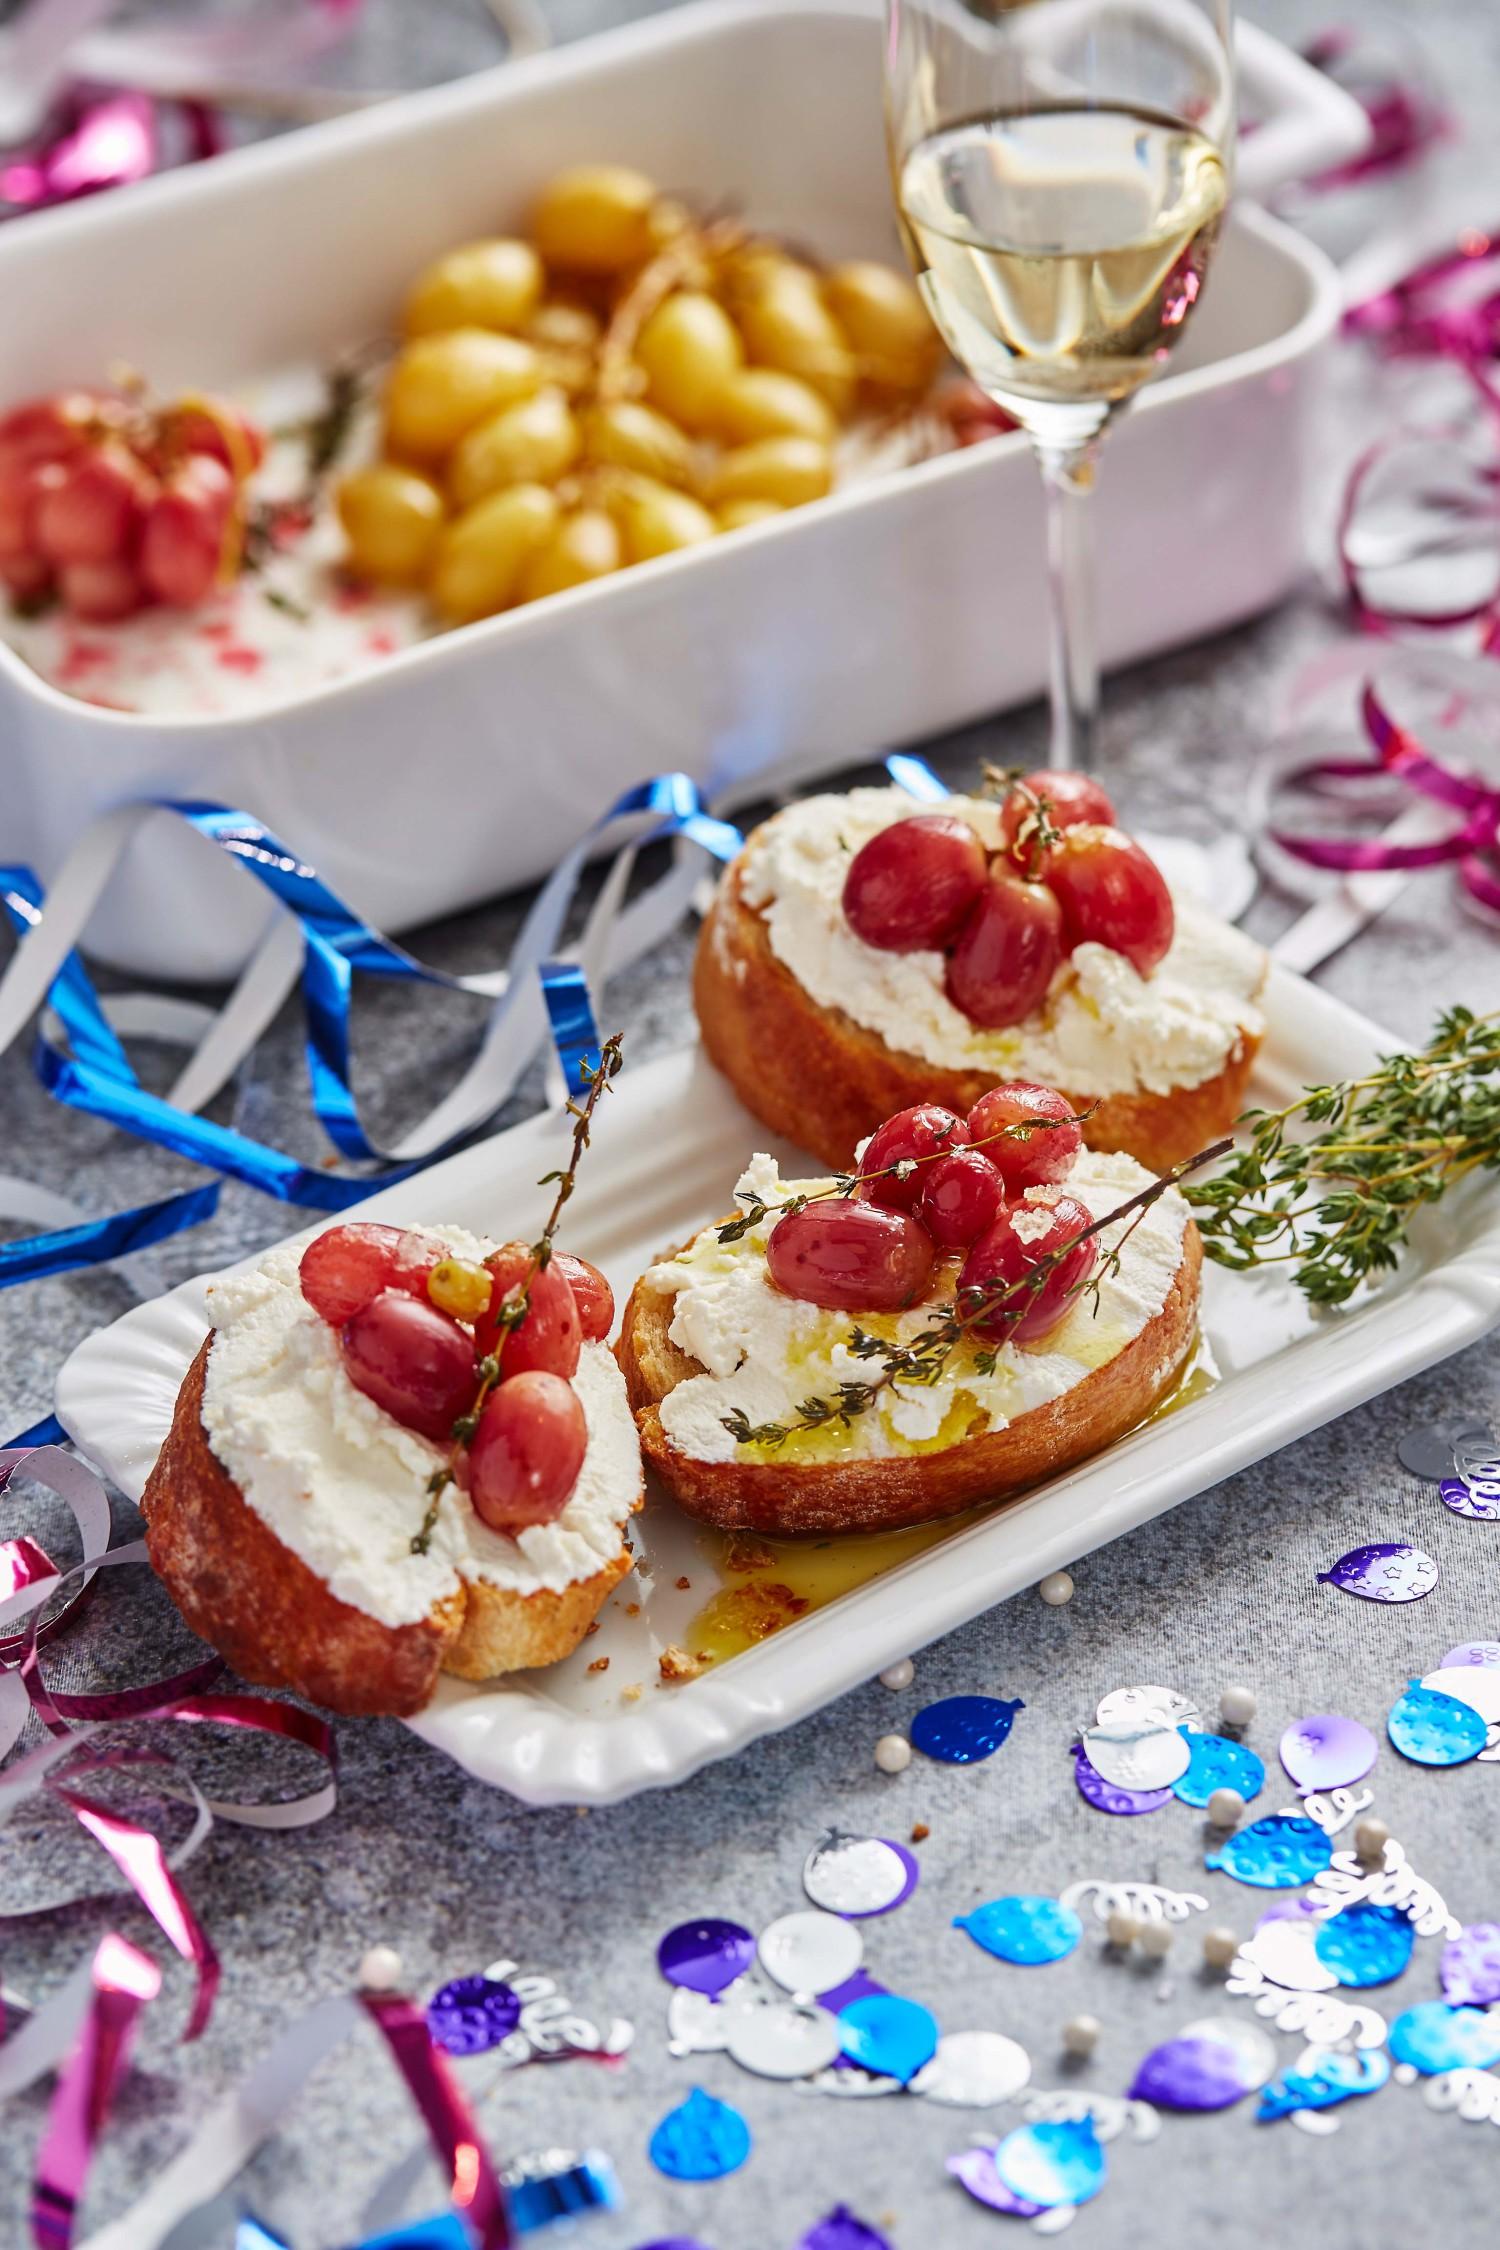 New Year's Eve Snacks & Rites